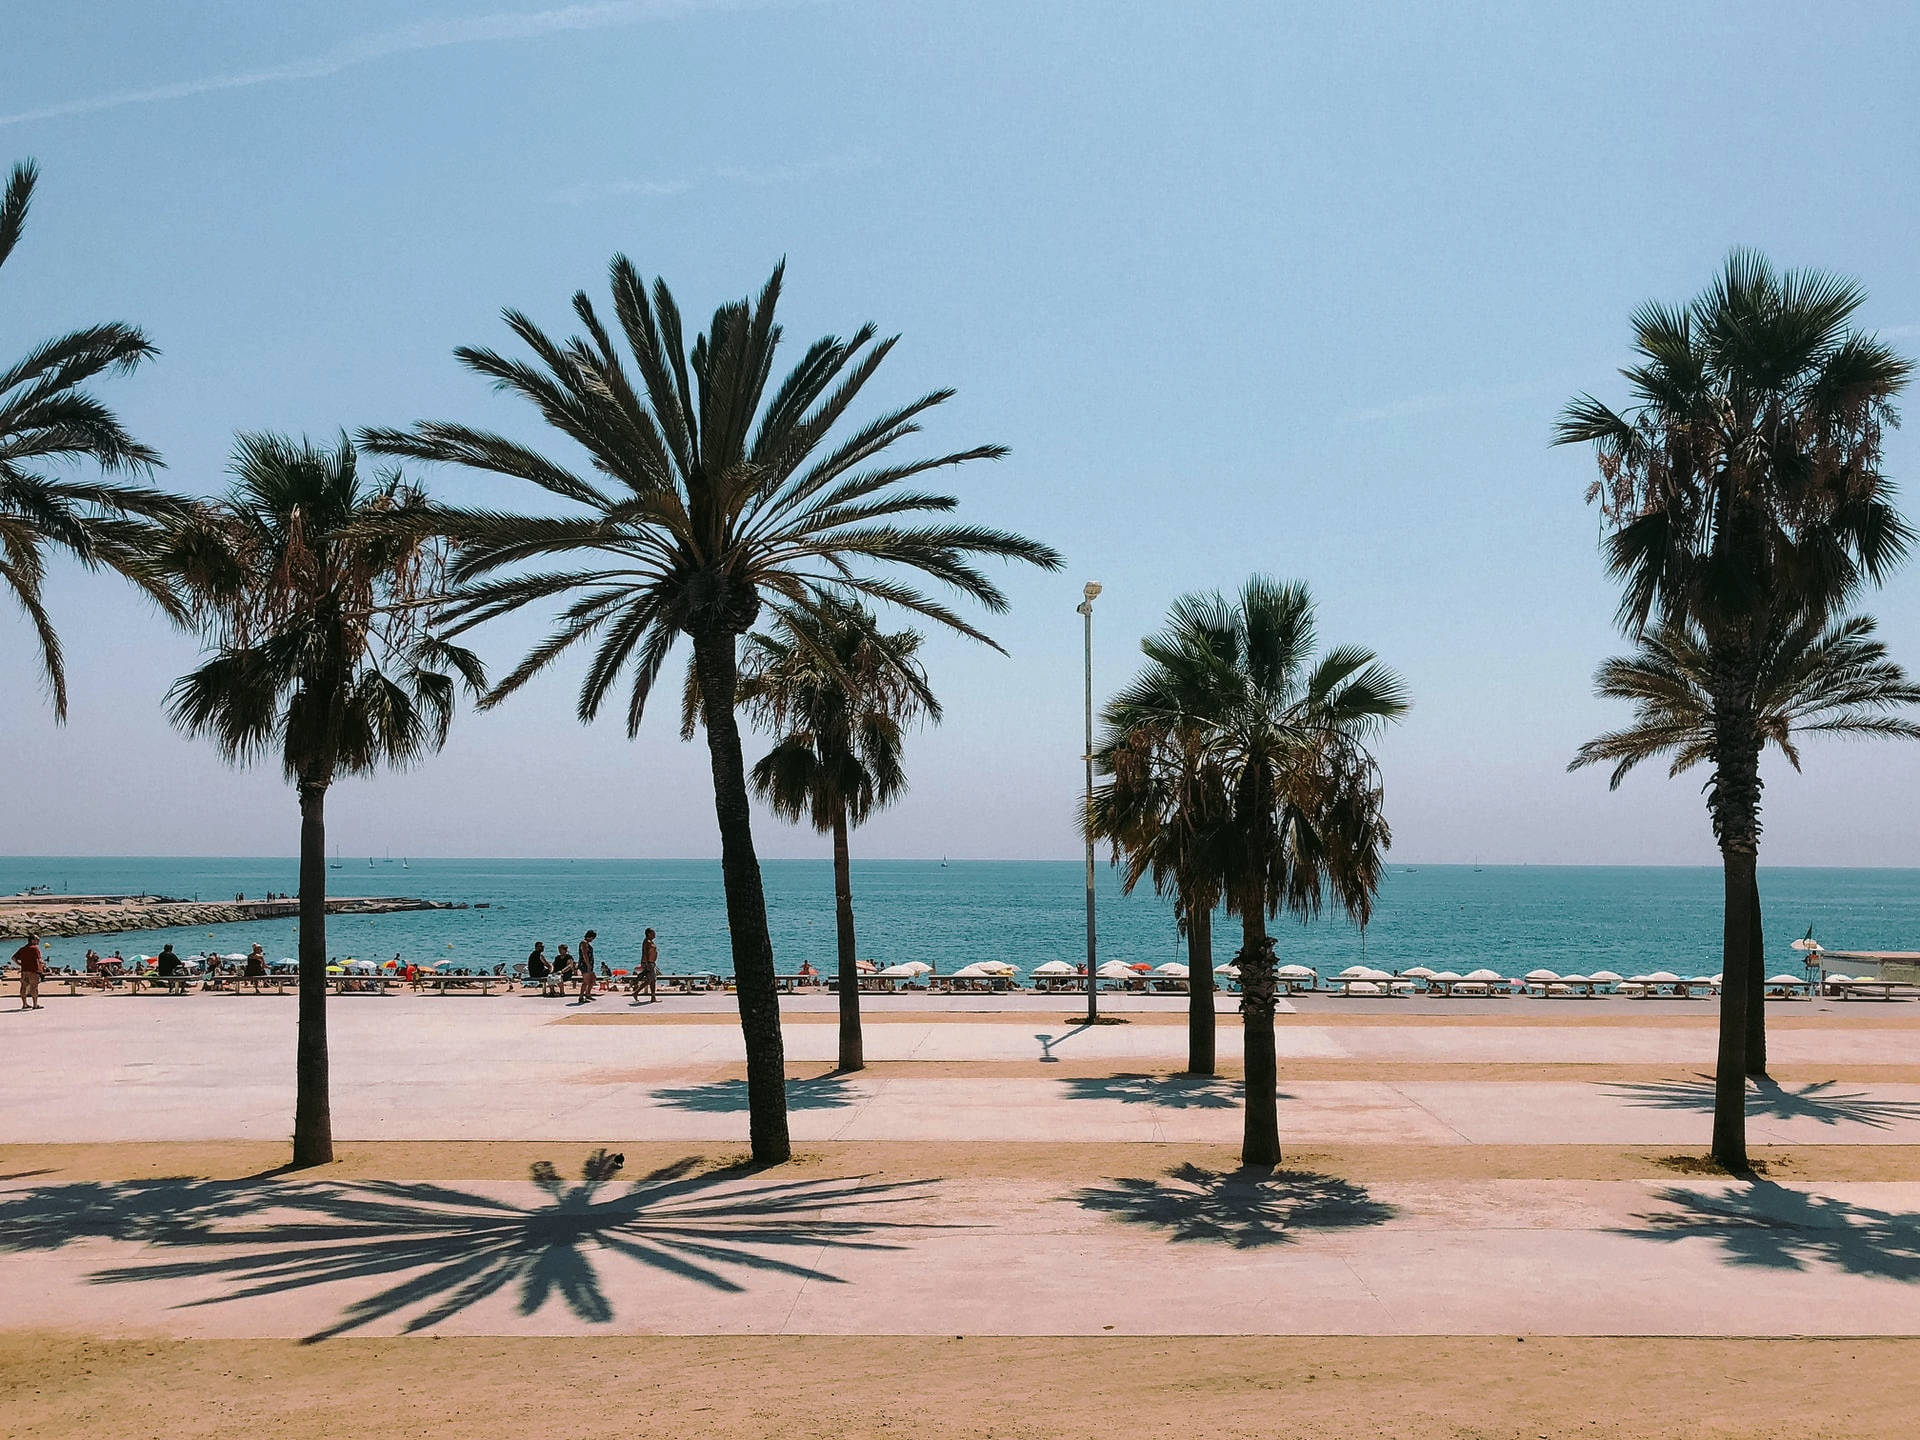 Barceloneta Beach Spain - La Barceloneta